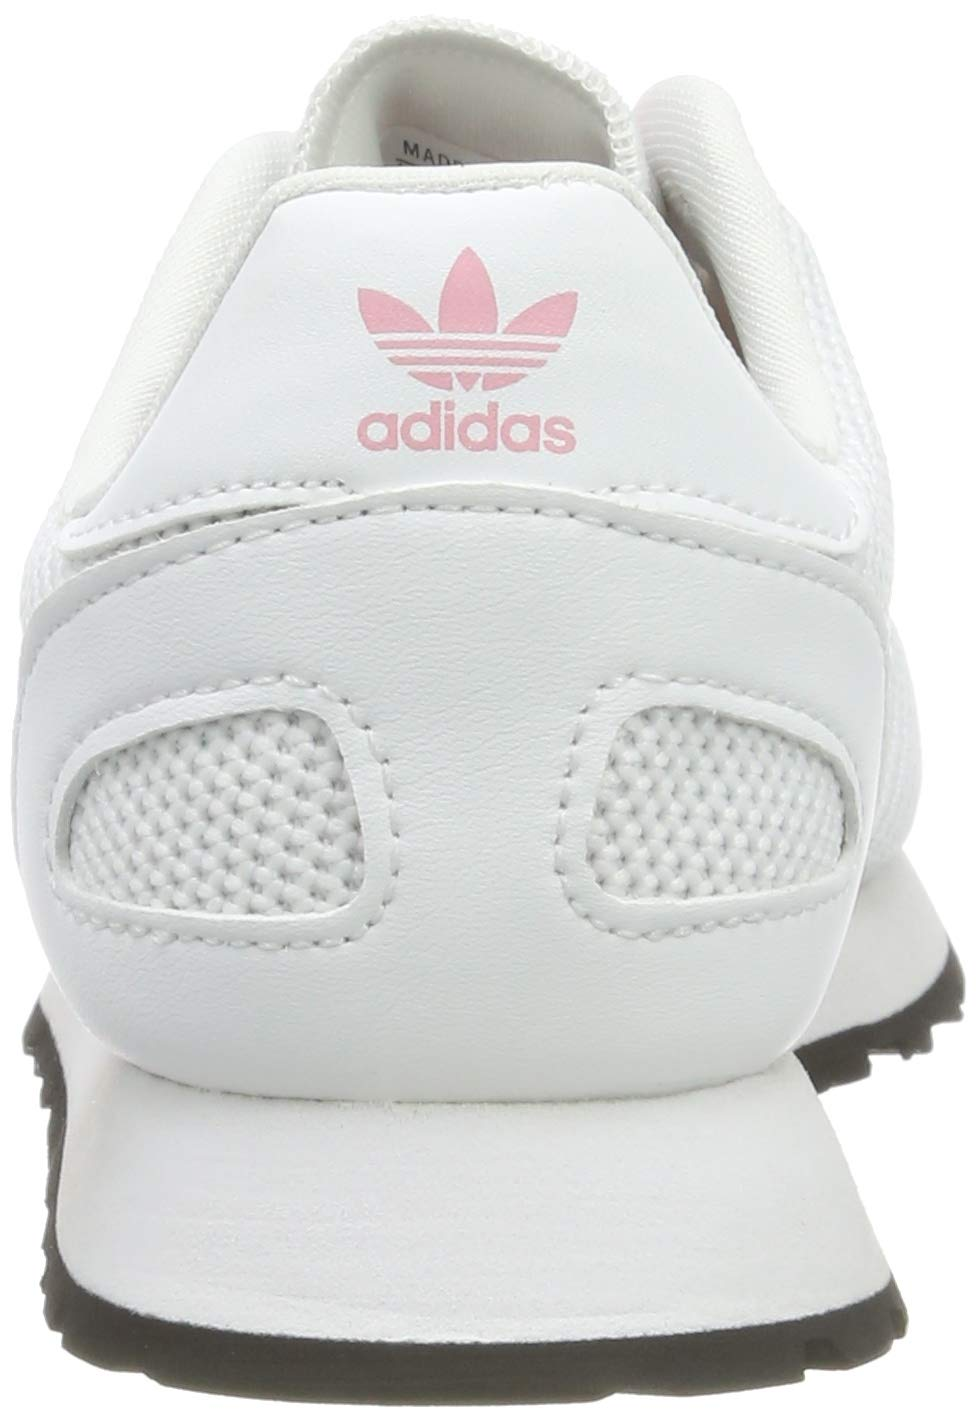 adidas 5923 bambino 22 scarpe